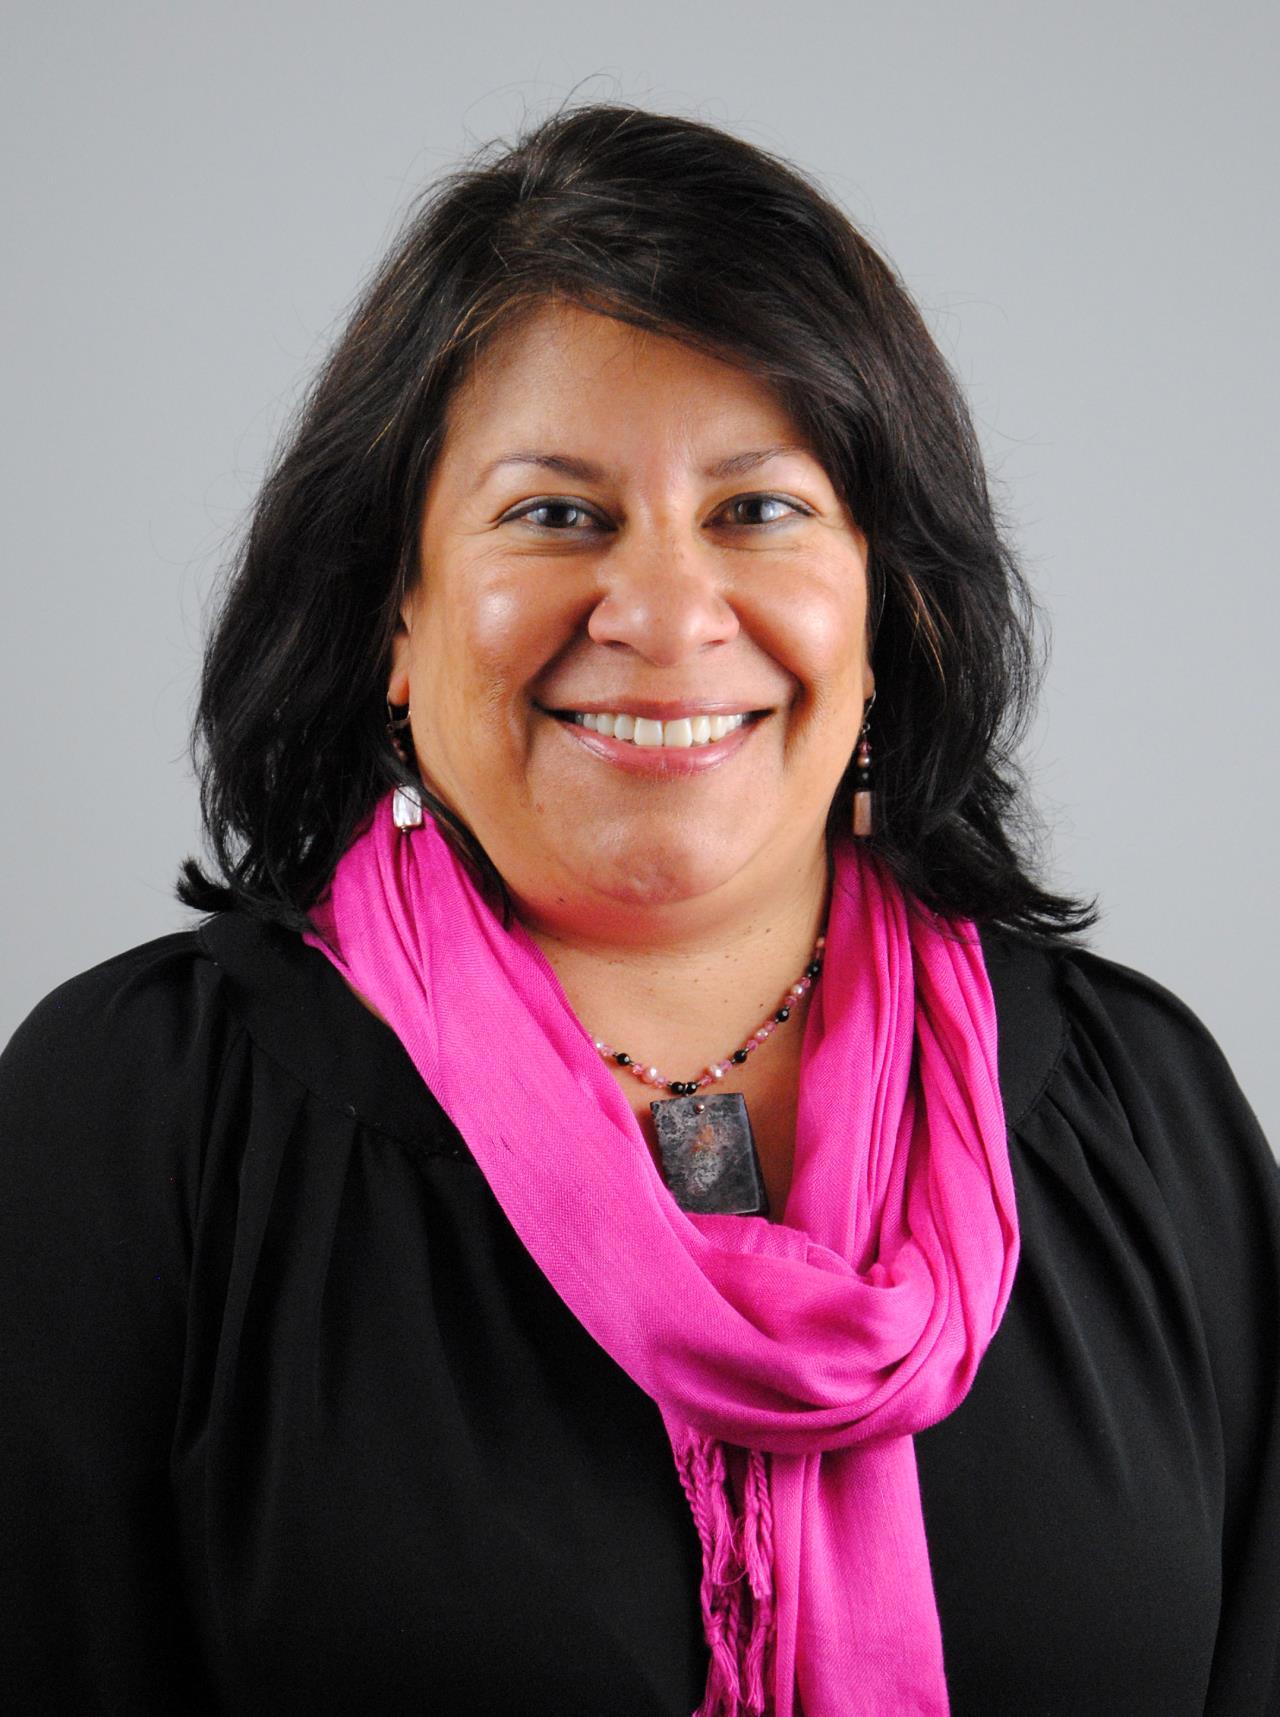 Economic Development Manager Charlene Rosales